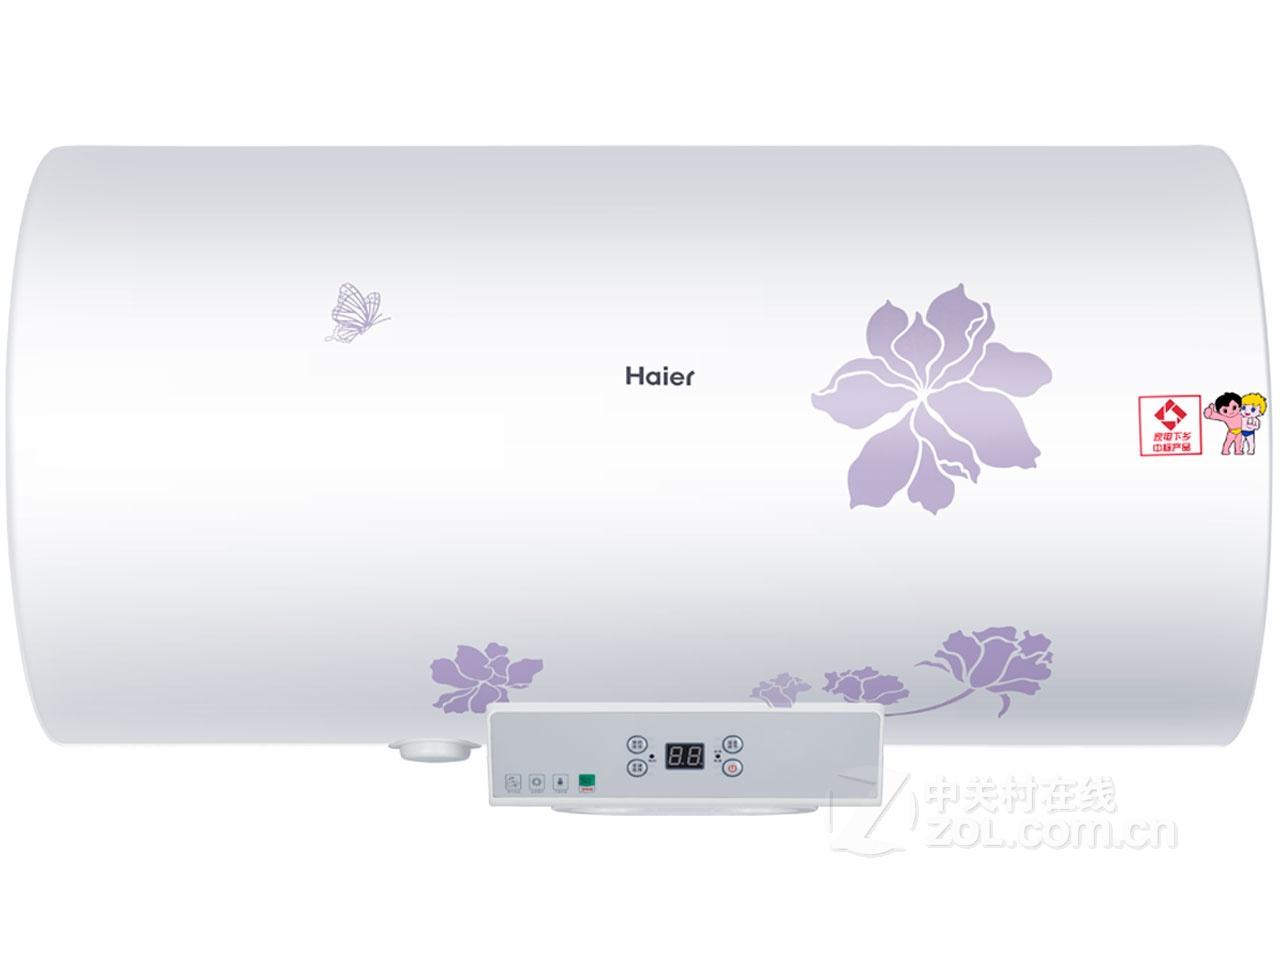 海尔电热水器 es 40h- d2 (ze); es 50h- d2 (ze); es  60h   d2 (ze)